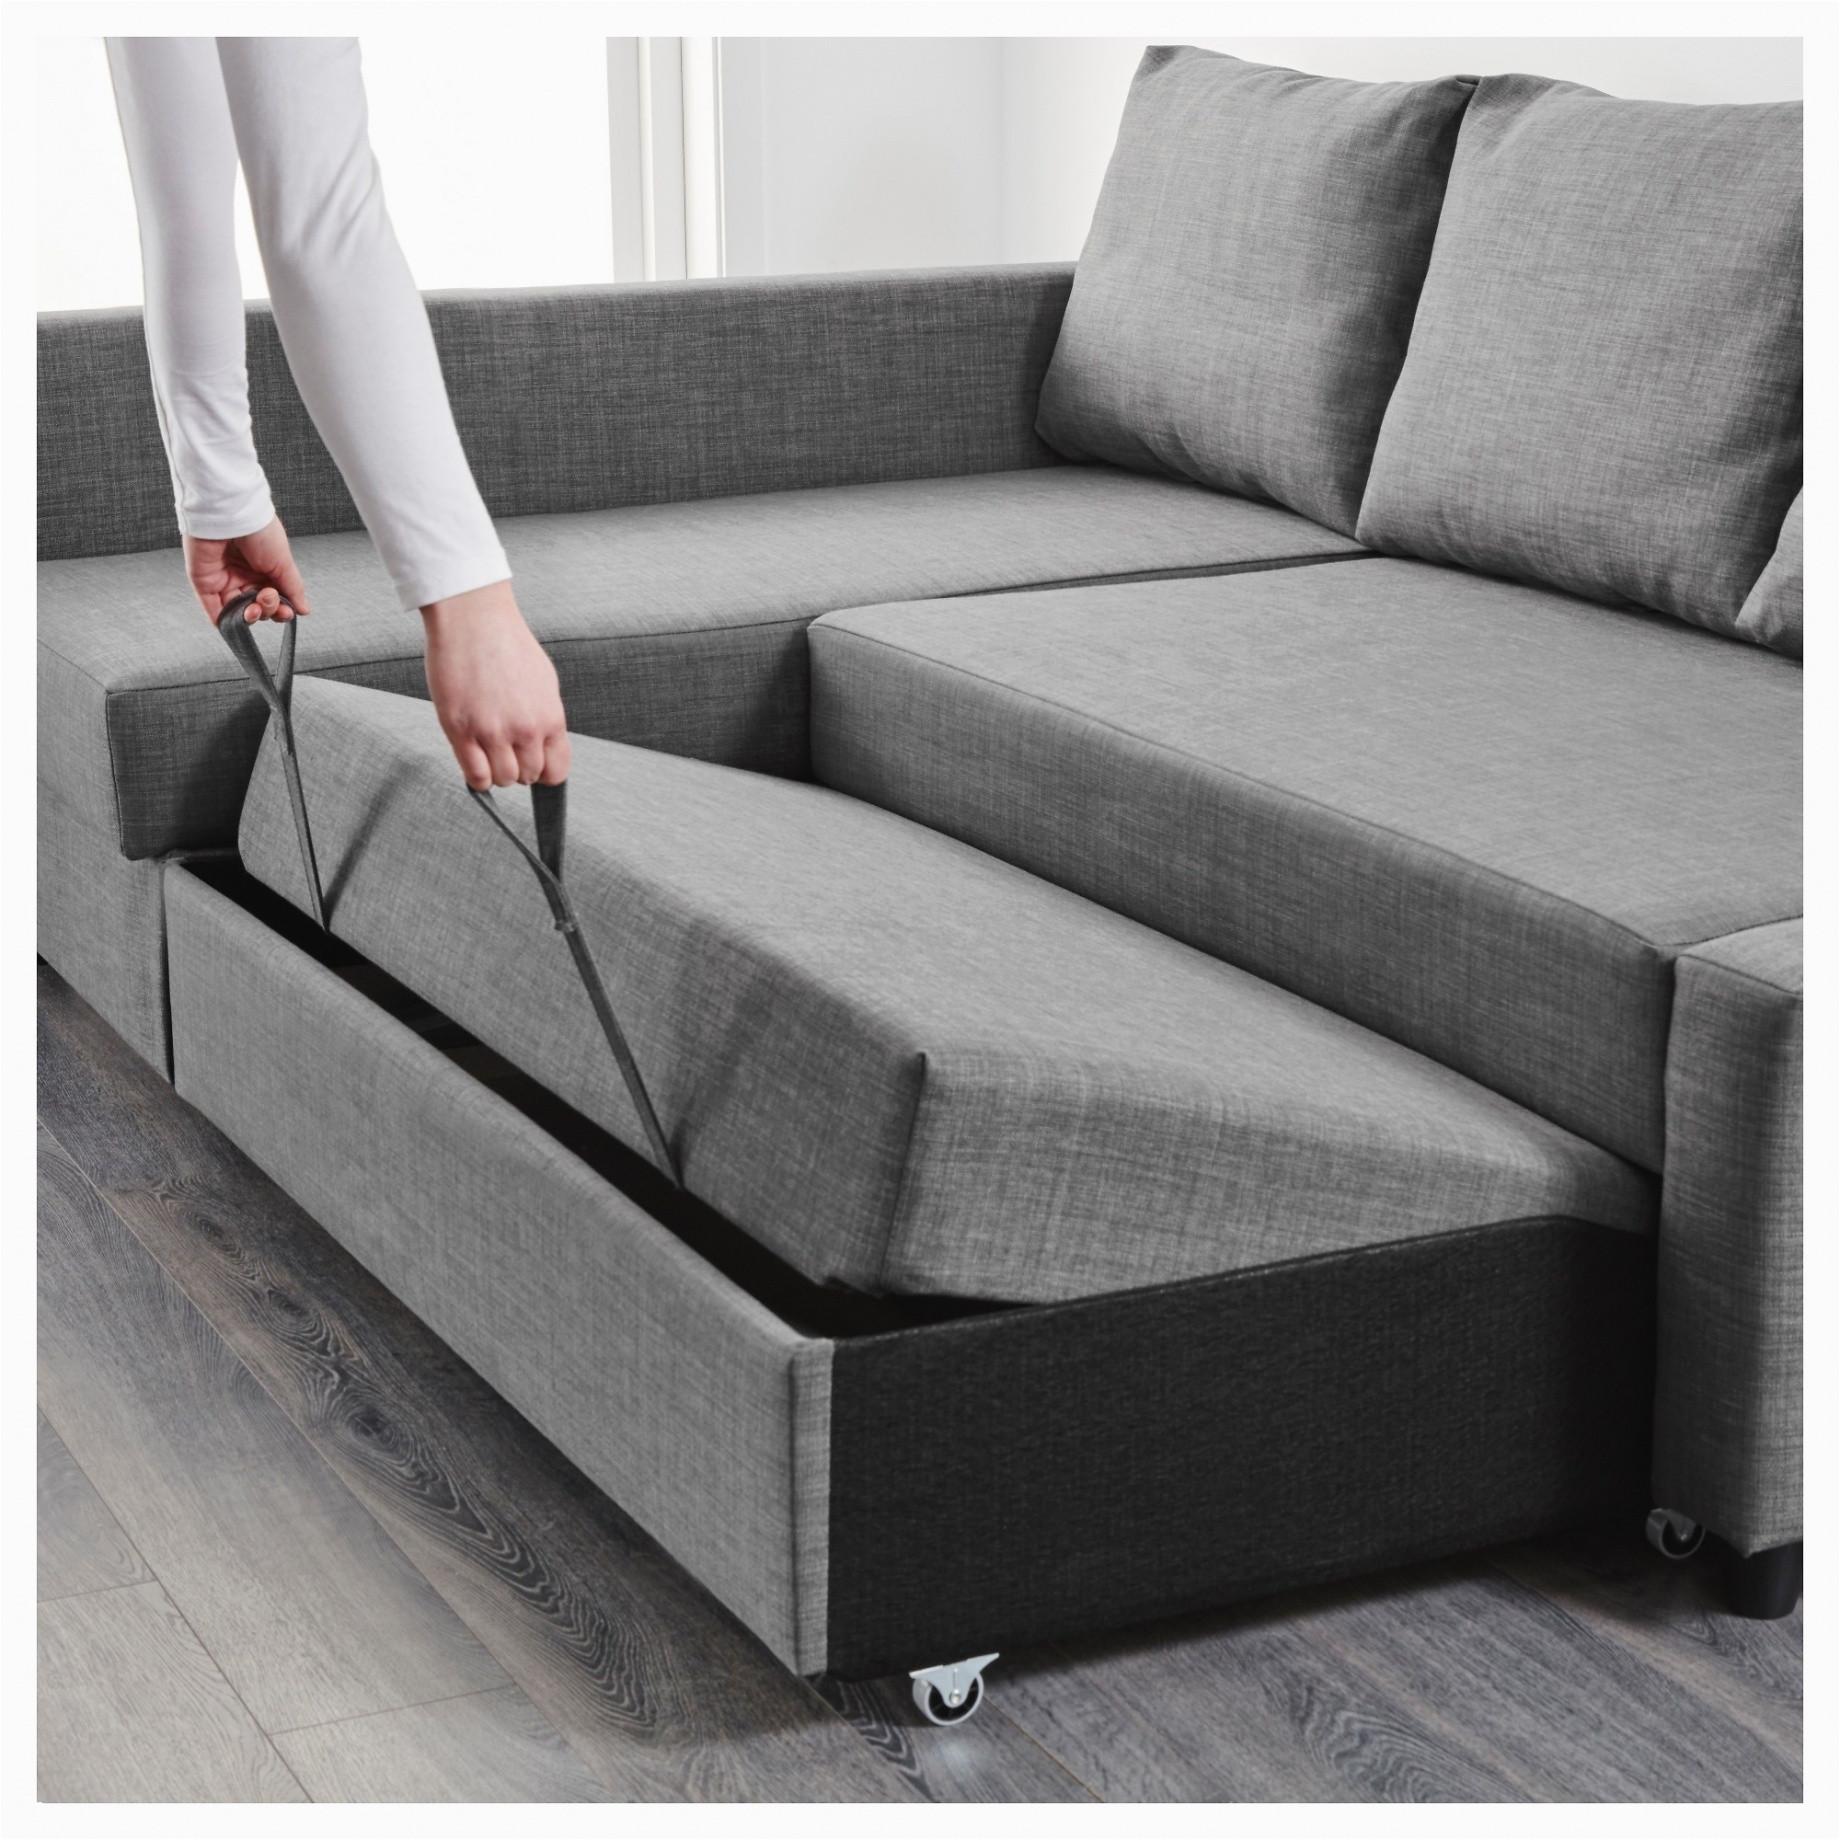 cama ikea a ikea sofa bed unique futon schon futon bettrahmen bett 120x190 0d archives ansprechend